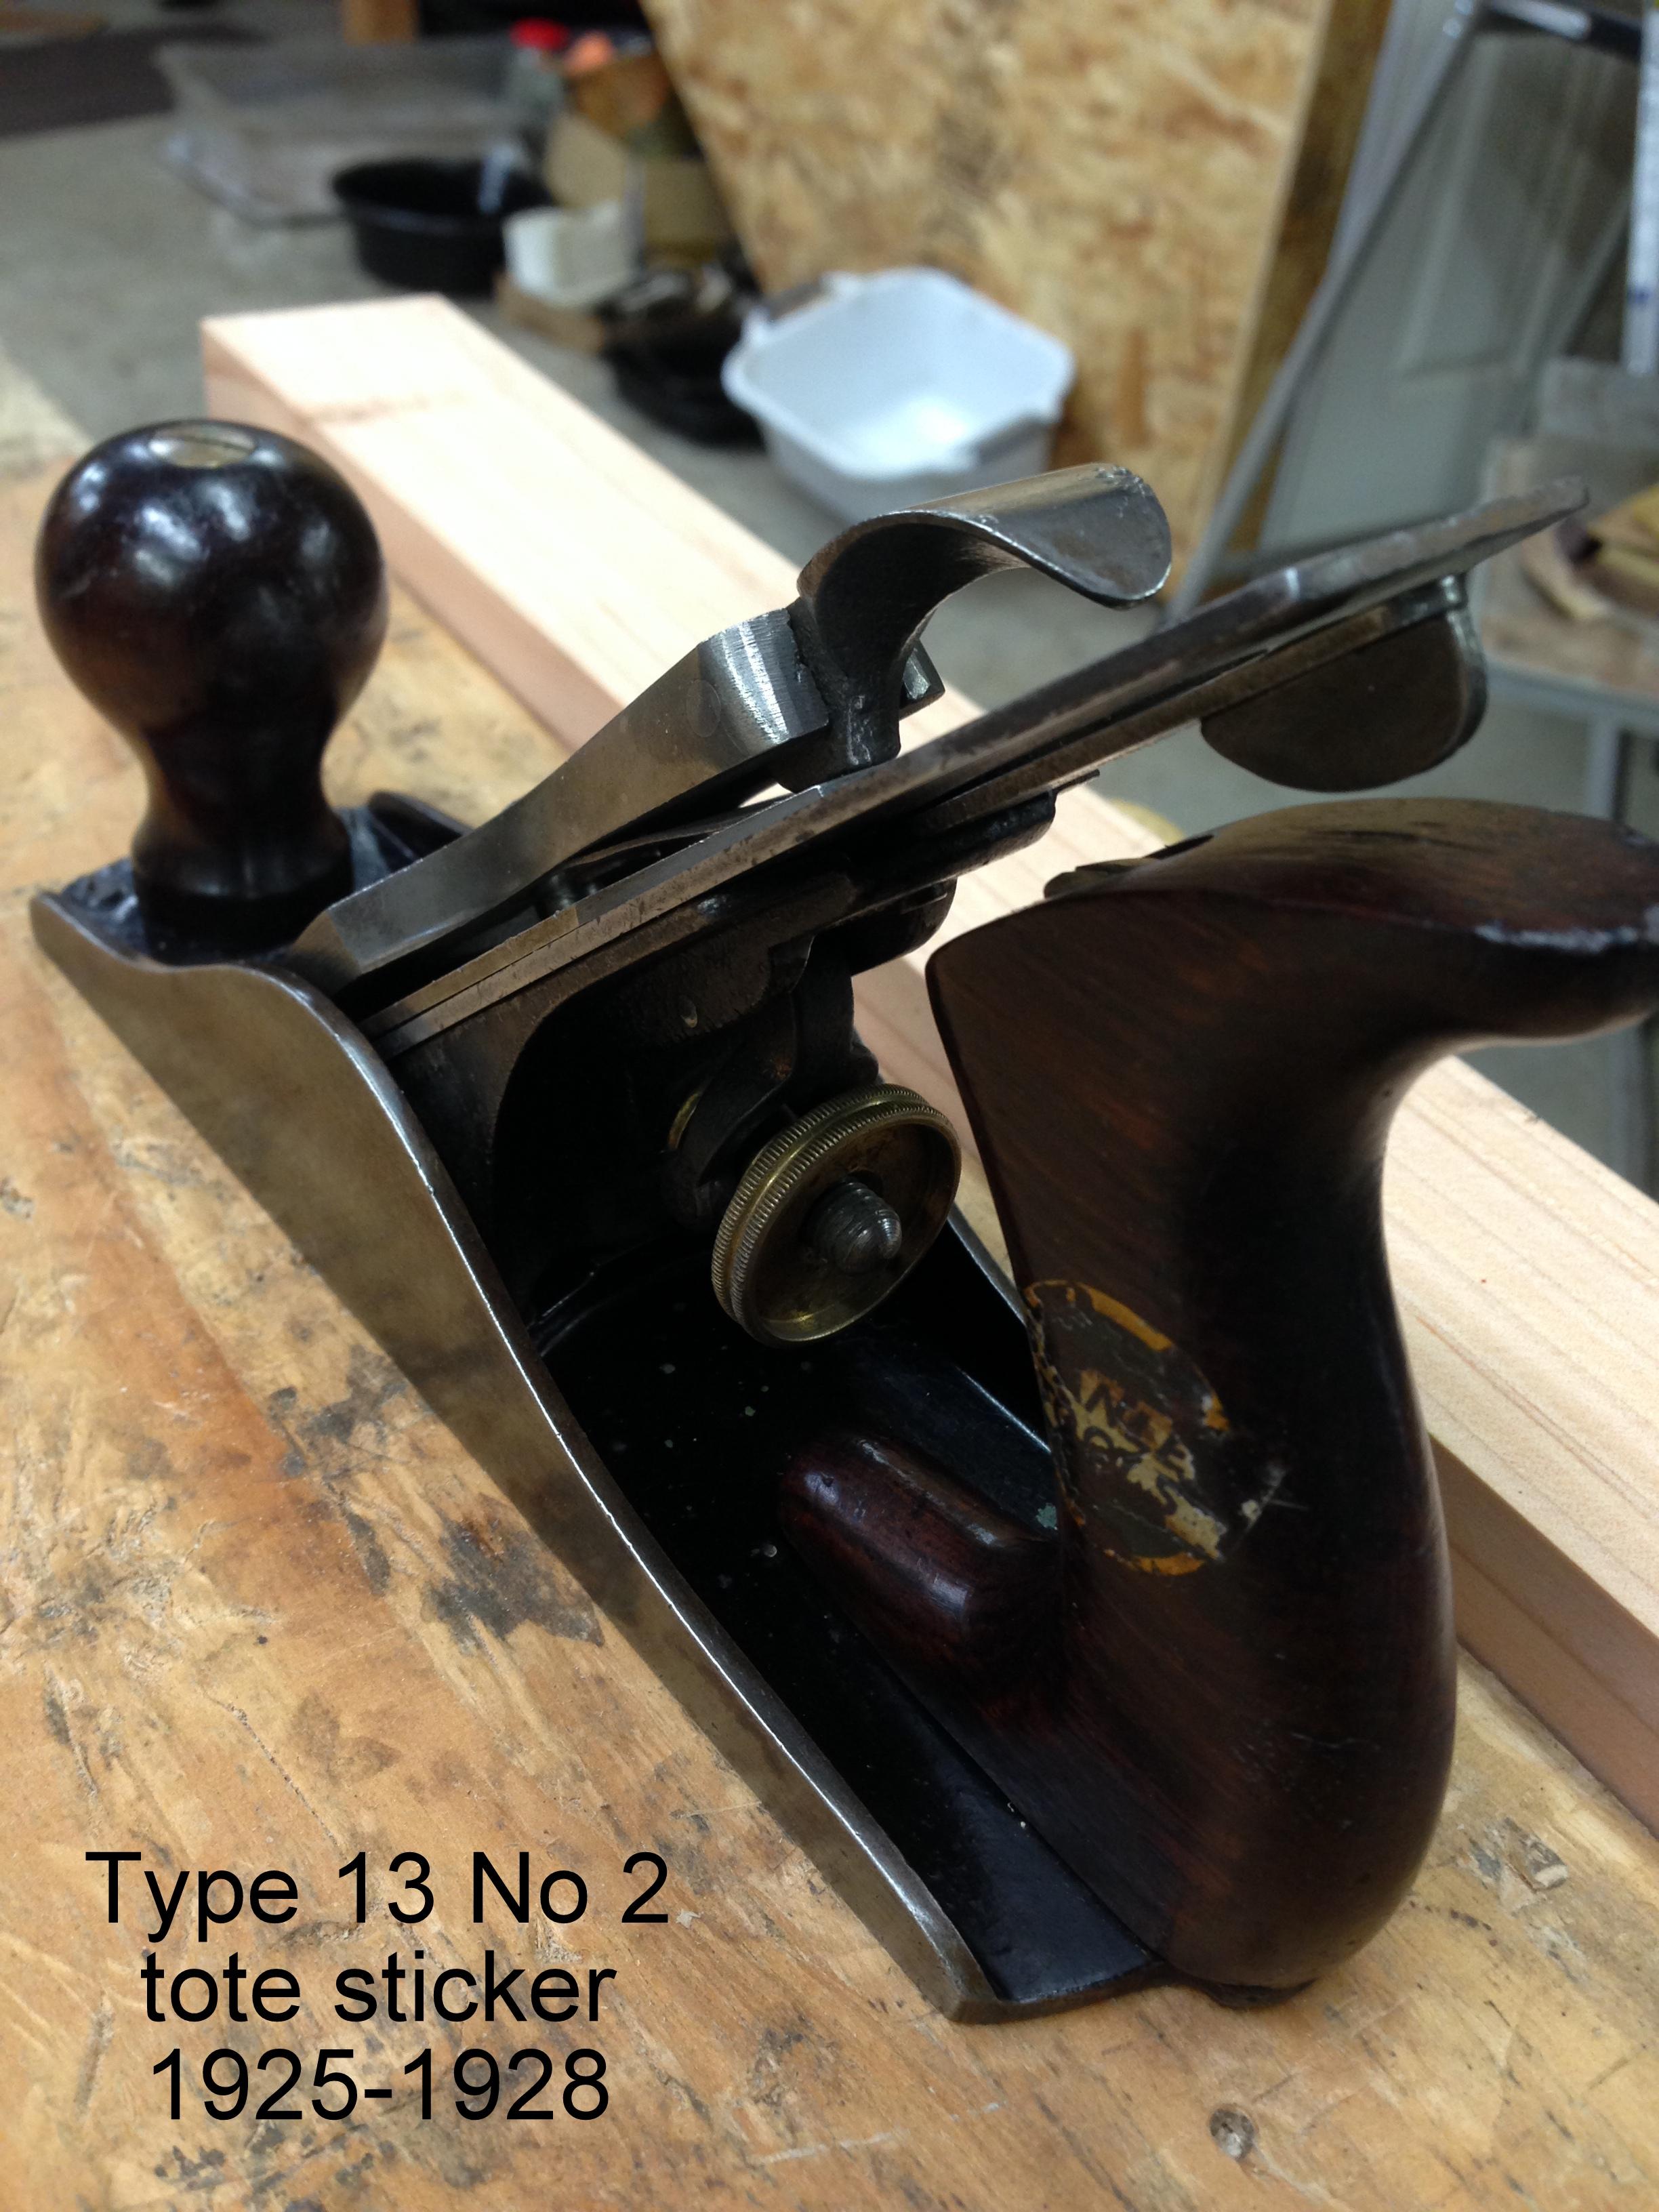 No 2 type 13